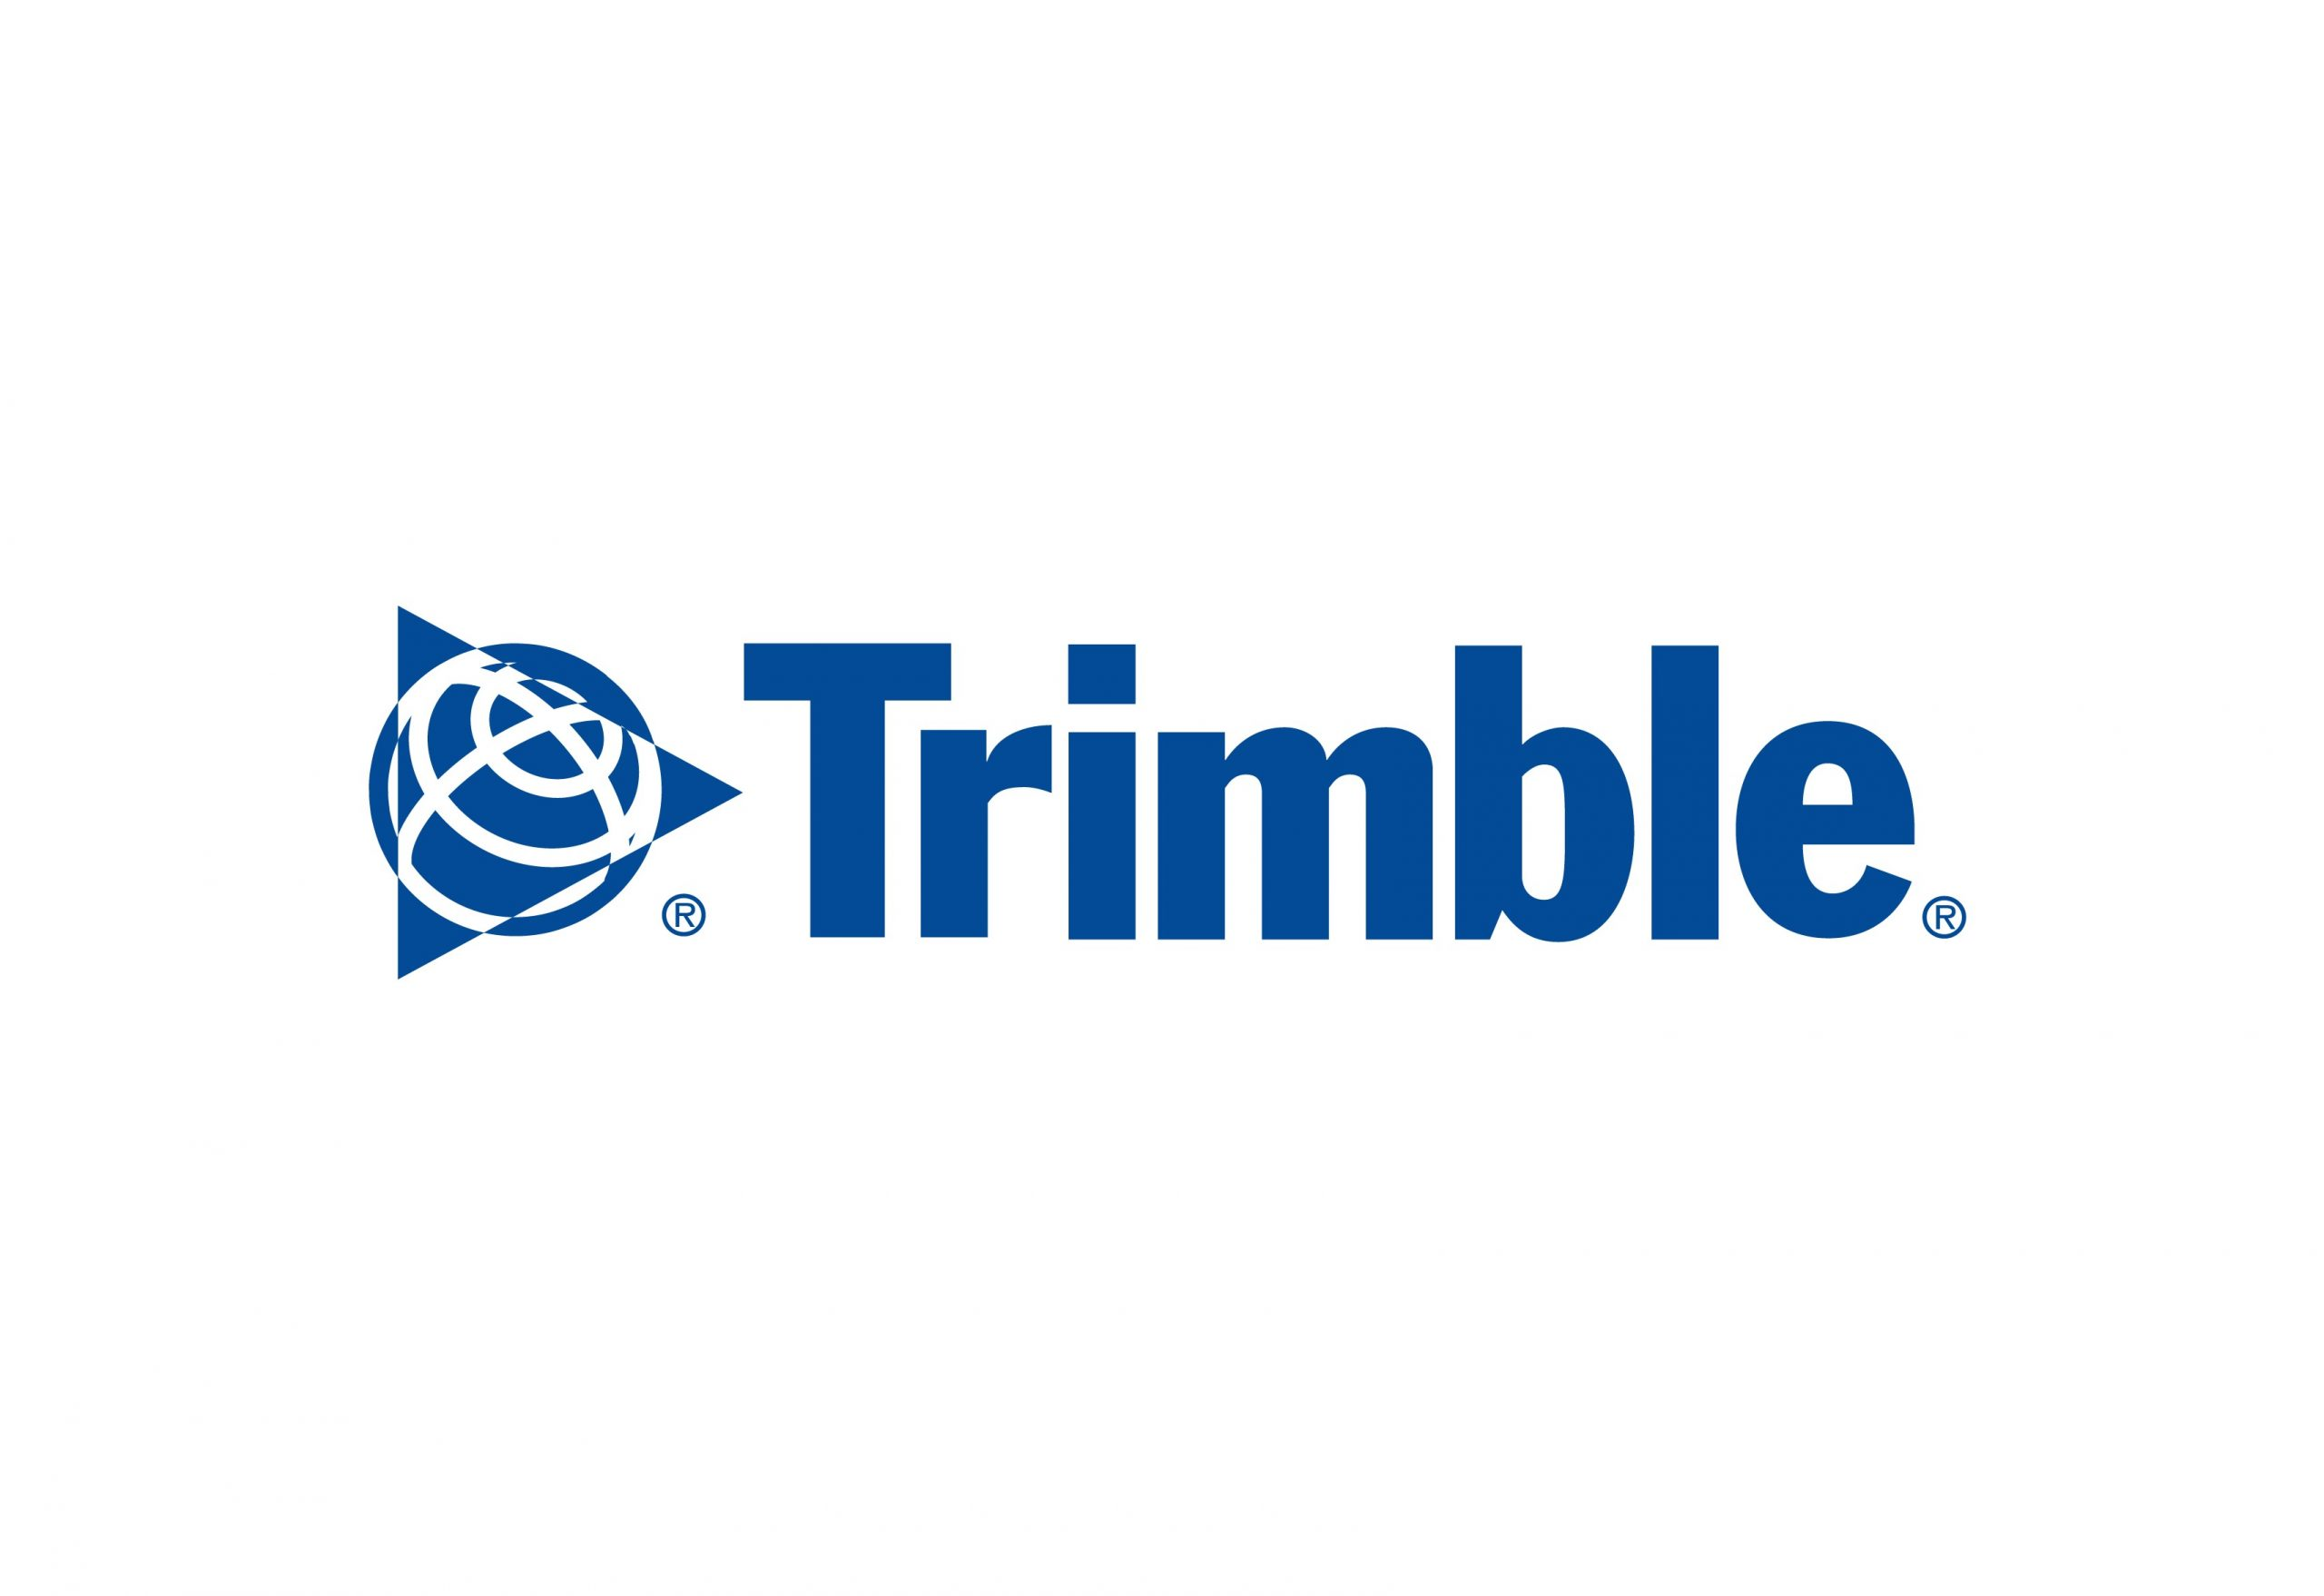 Spektra srl società del gruppo Trimble Inc